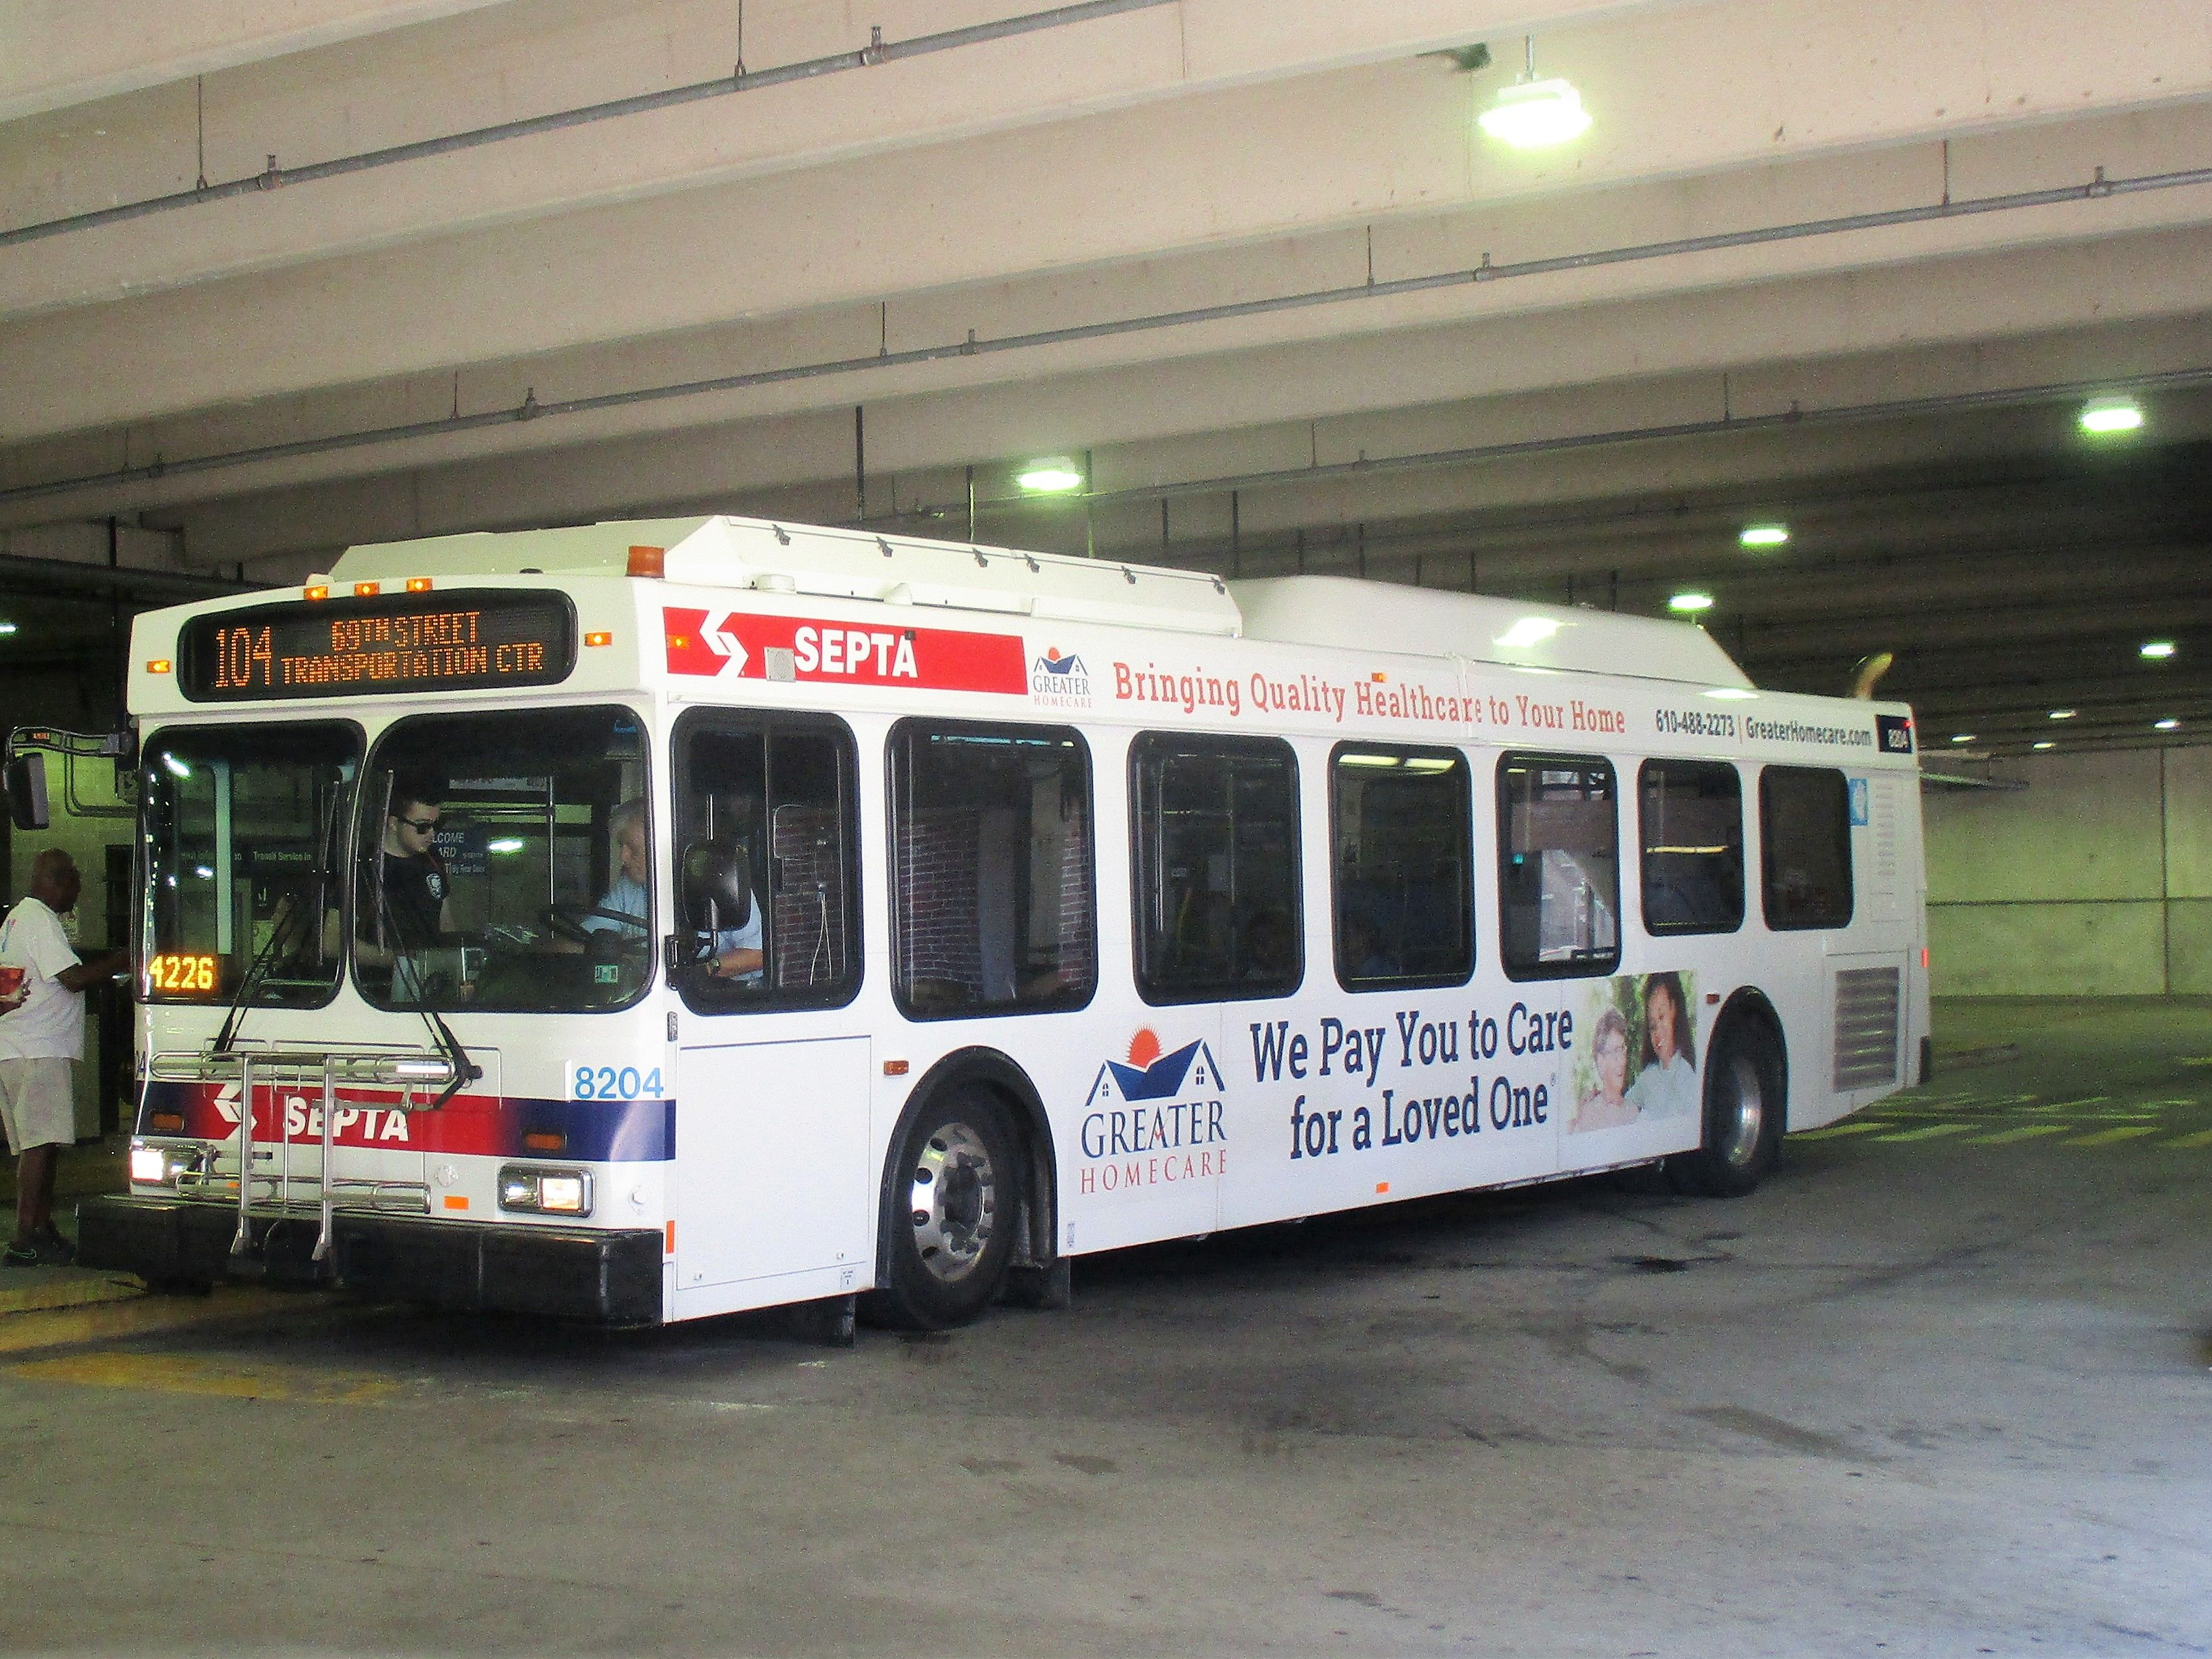 Septa New Flyer De41lf At West Chester Transportation Center New Flyer Bus Terminal Transportation